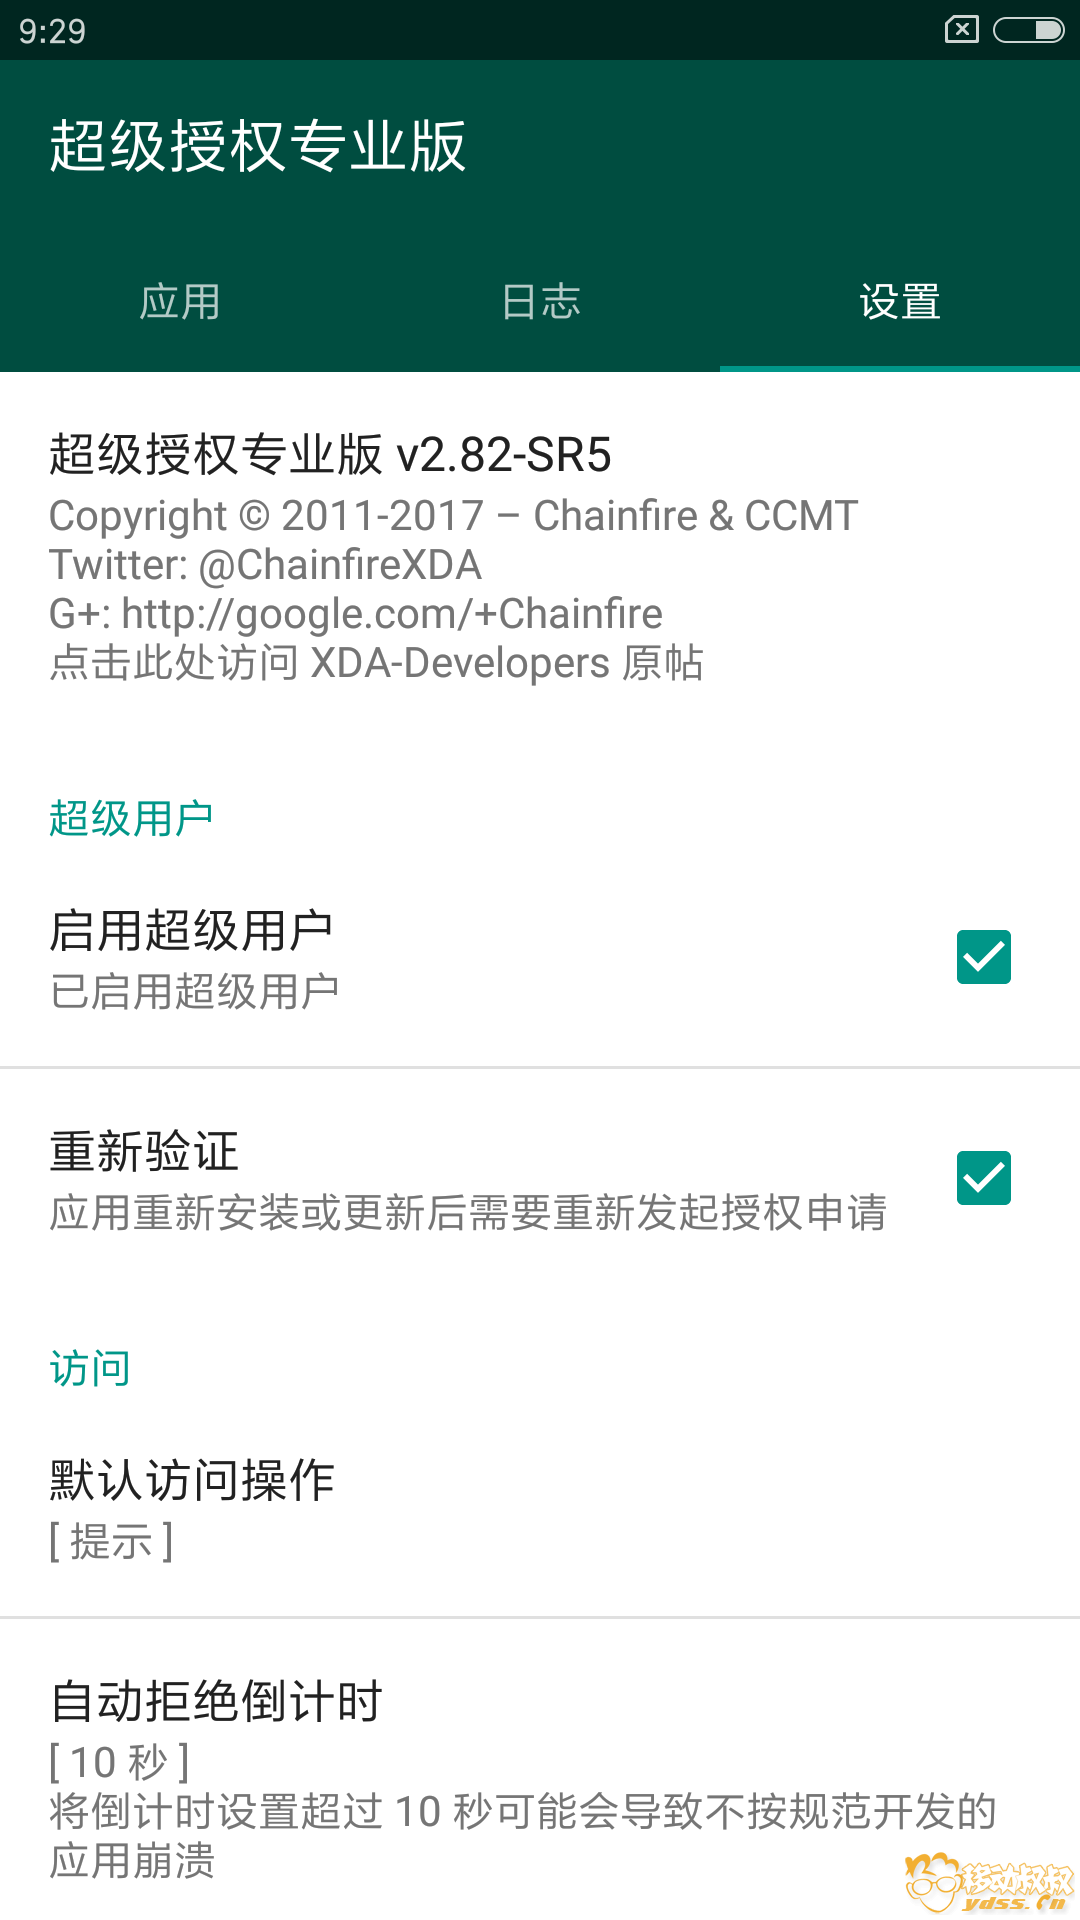 Screenshot_2018-01-27-09-29-16-465_eu.chainfire.supersu.png